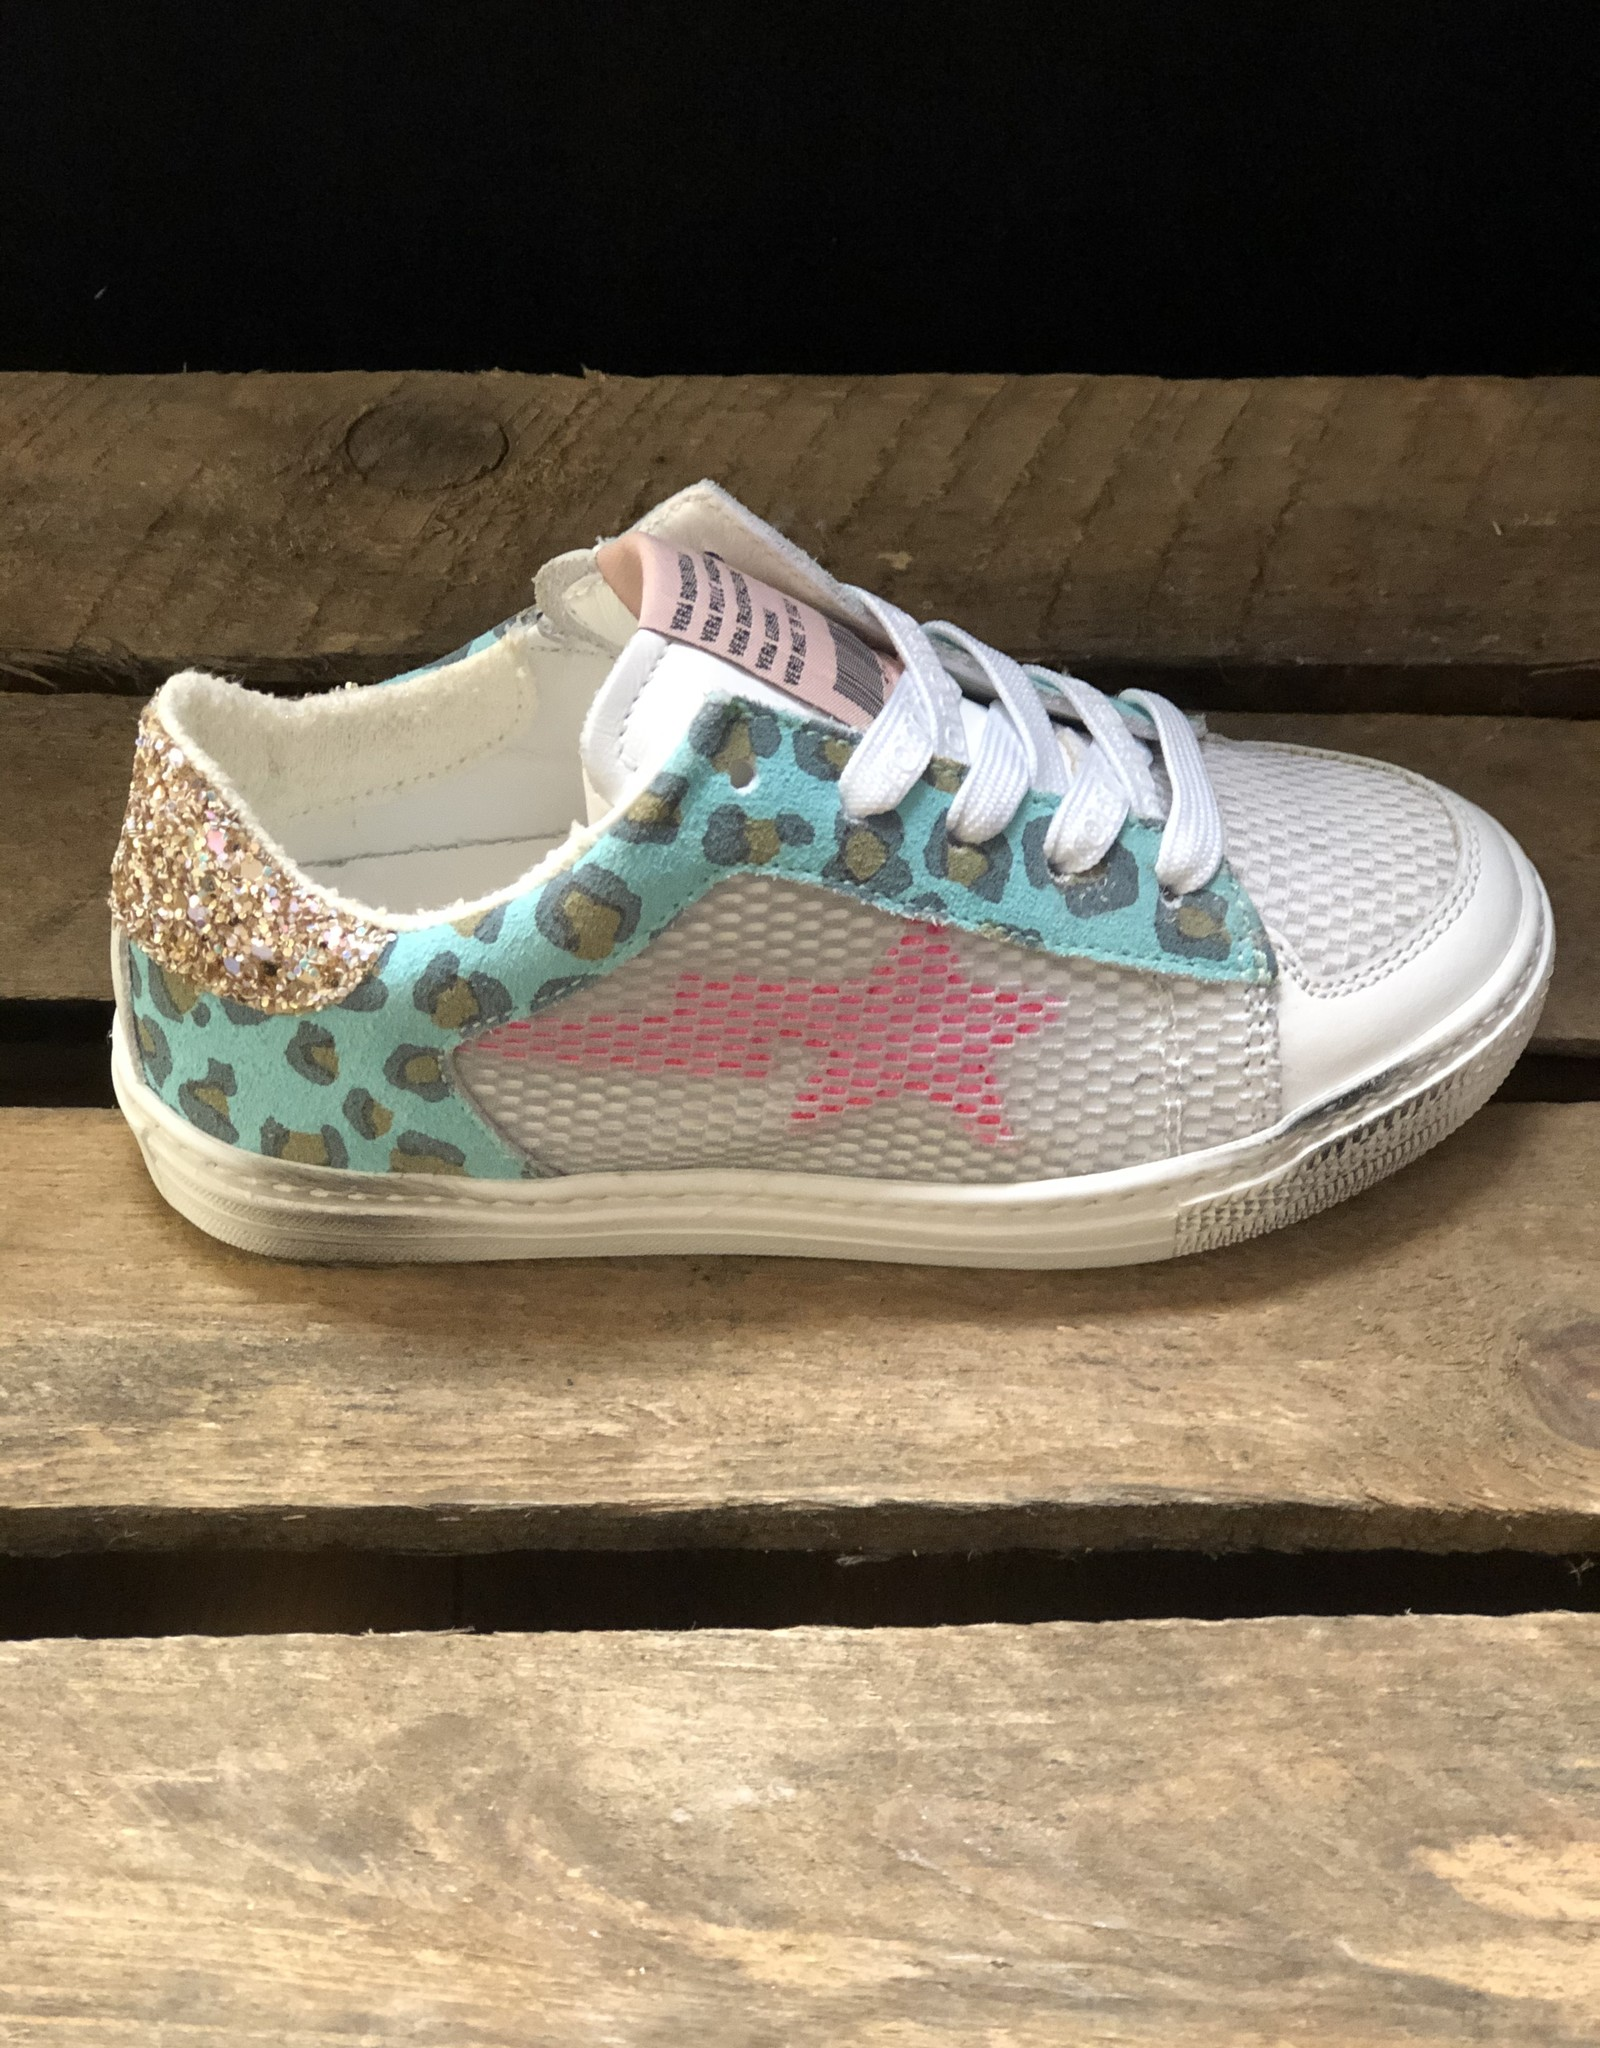 Rondinella 11731-1 sneaker wit/blauw roze ster veter/rits